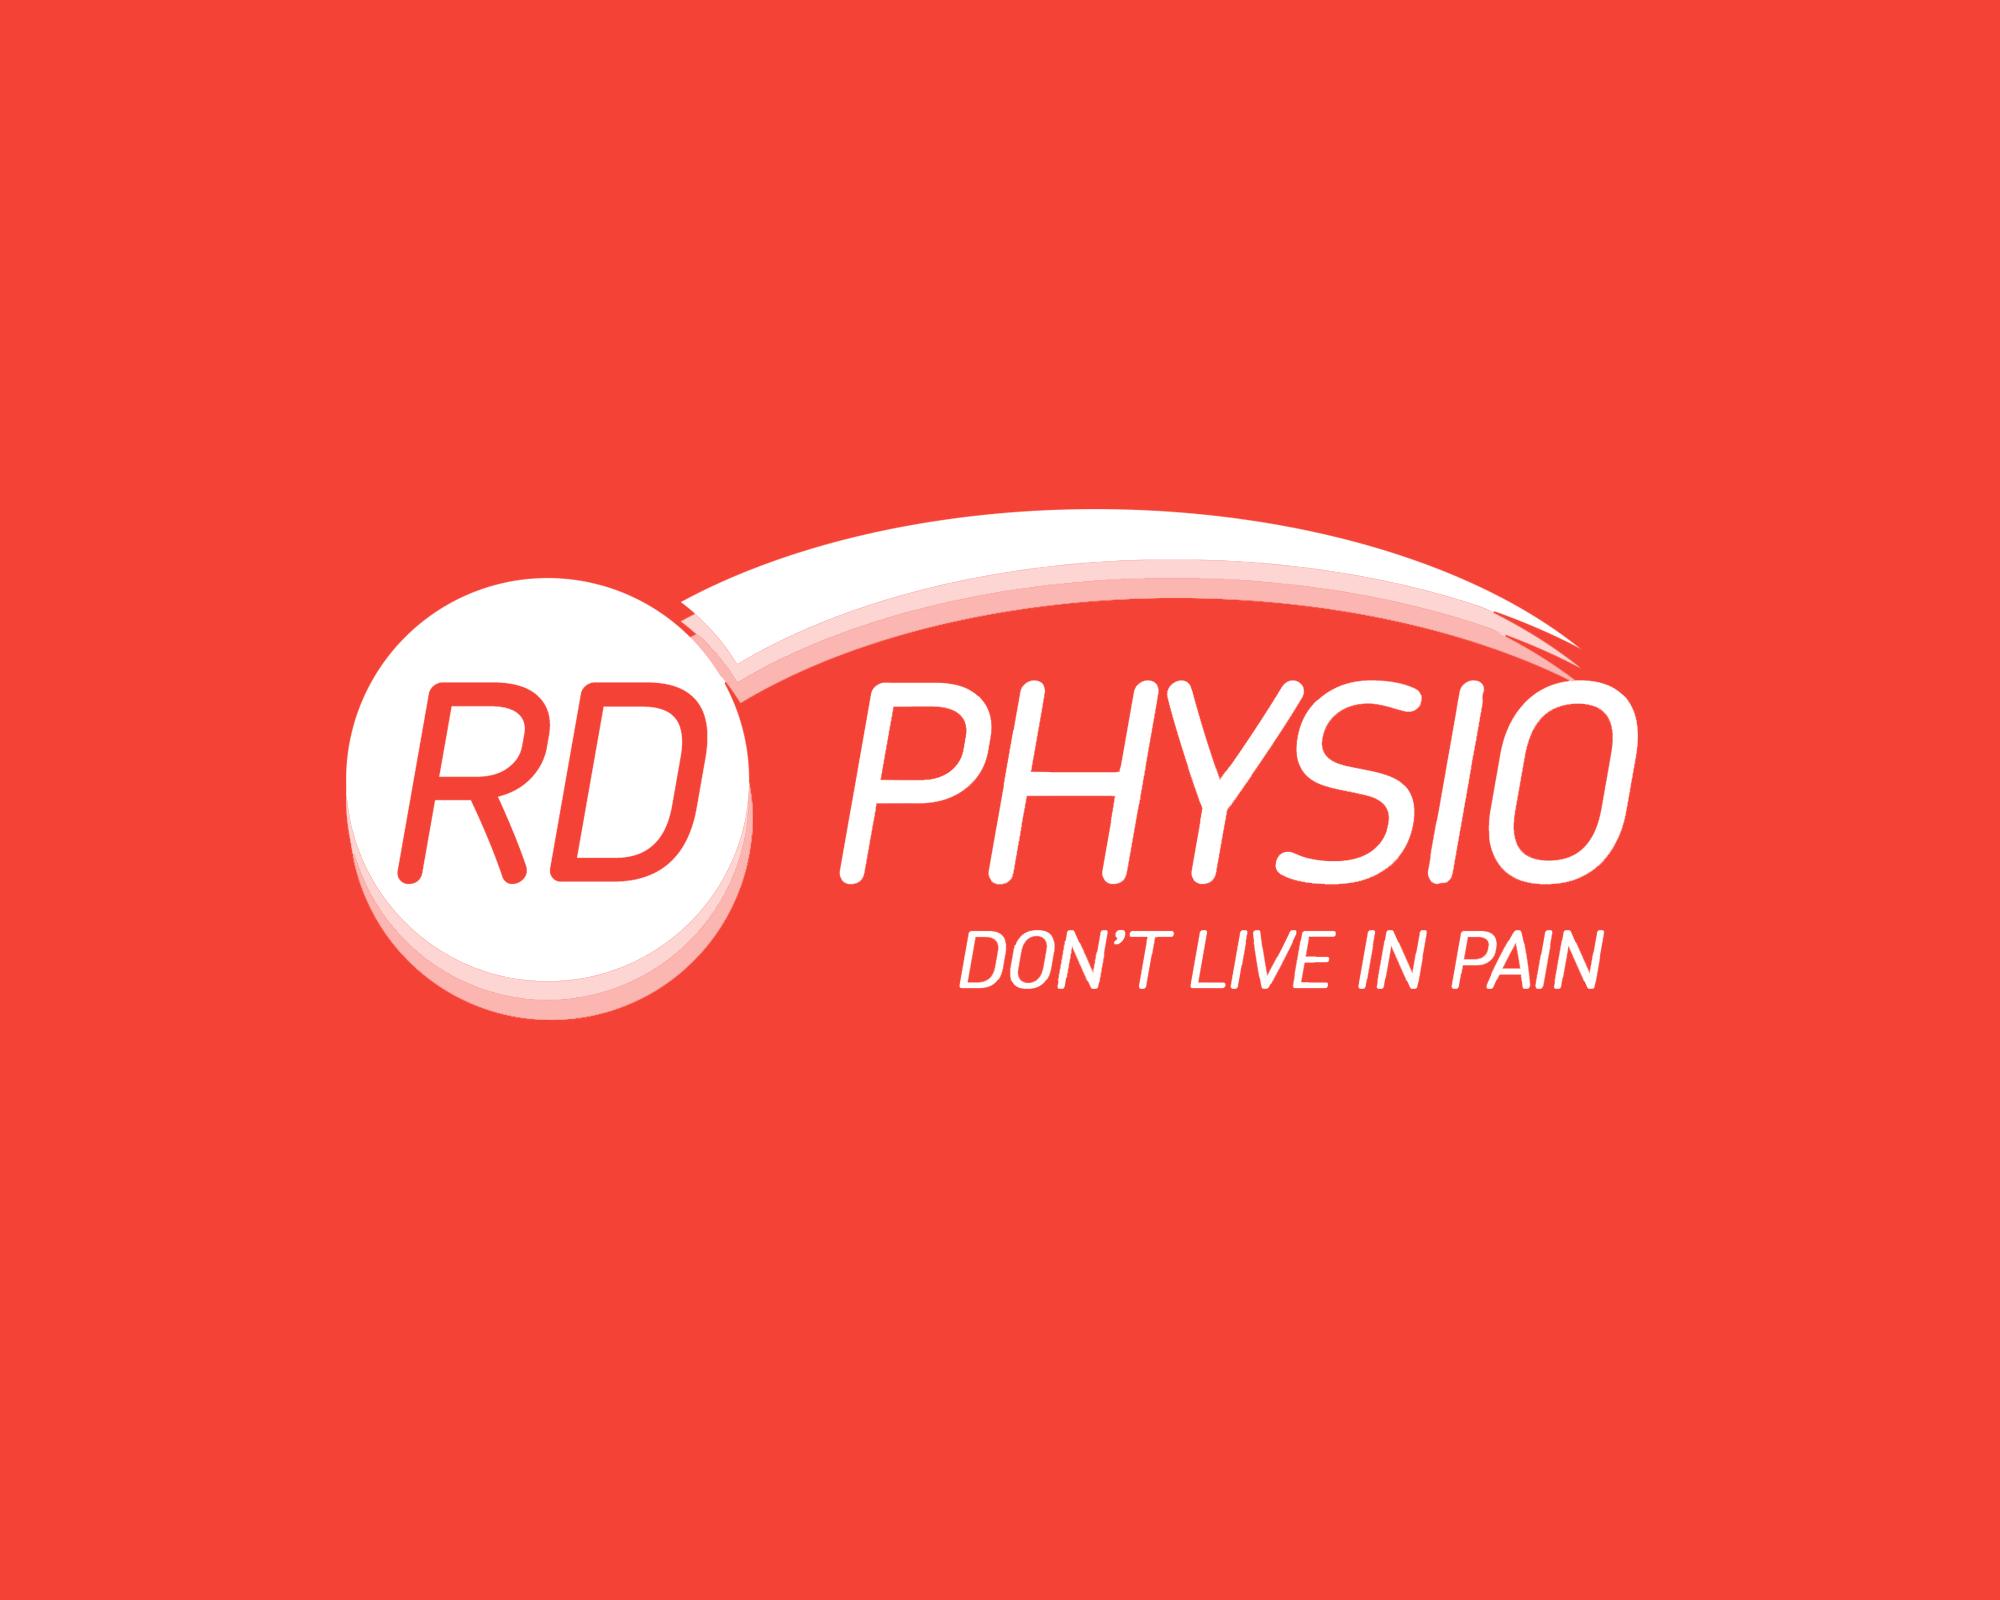 rd physio hull Logo